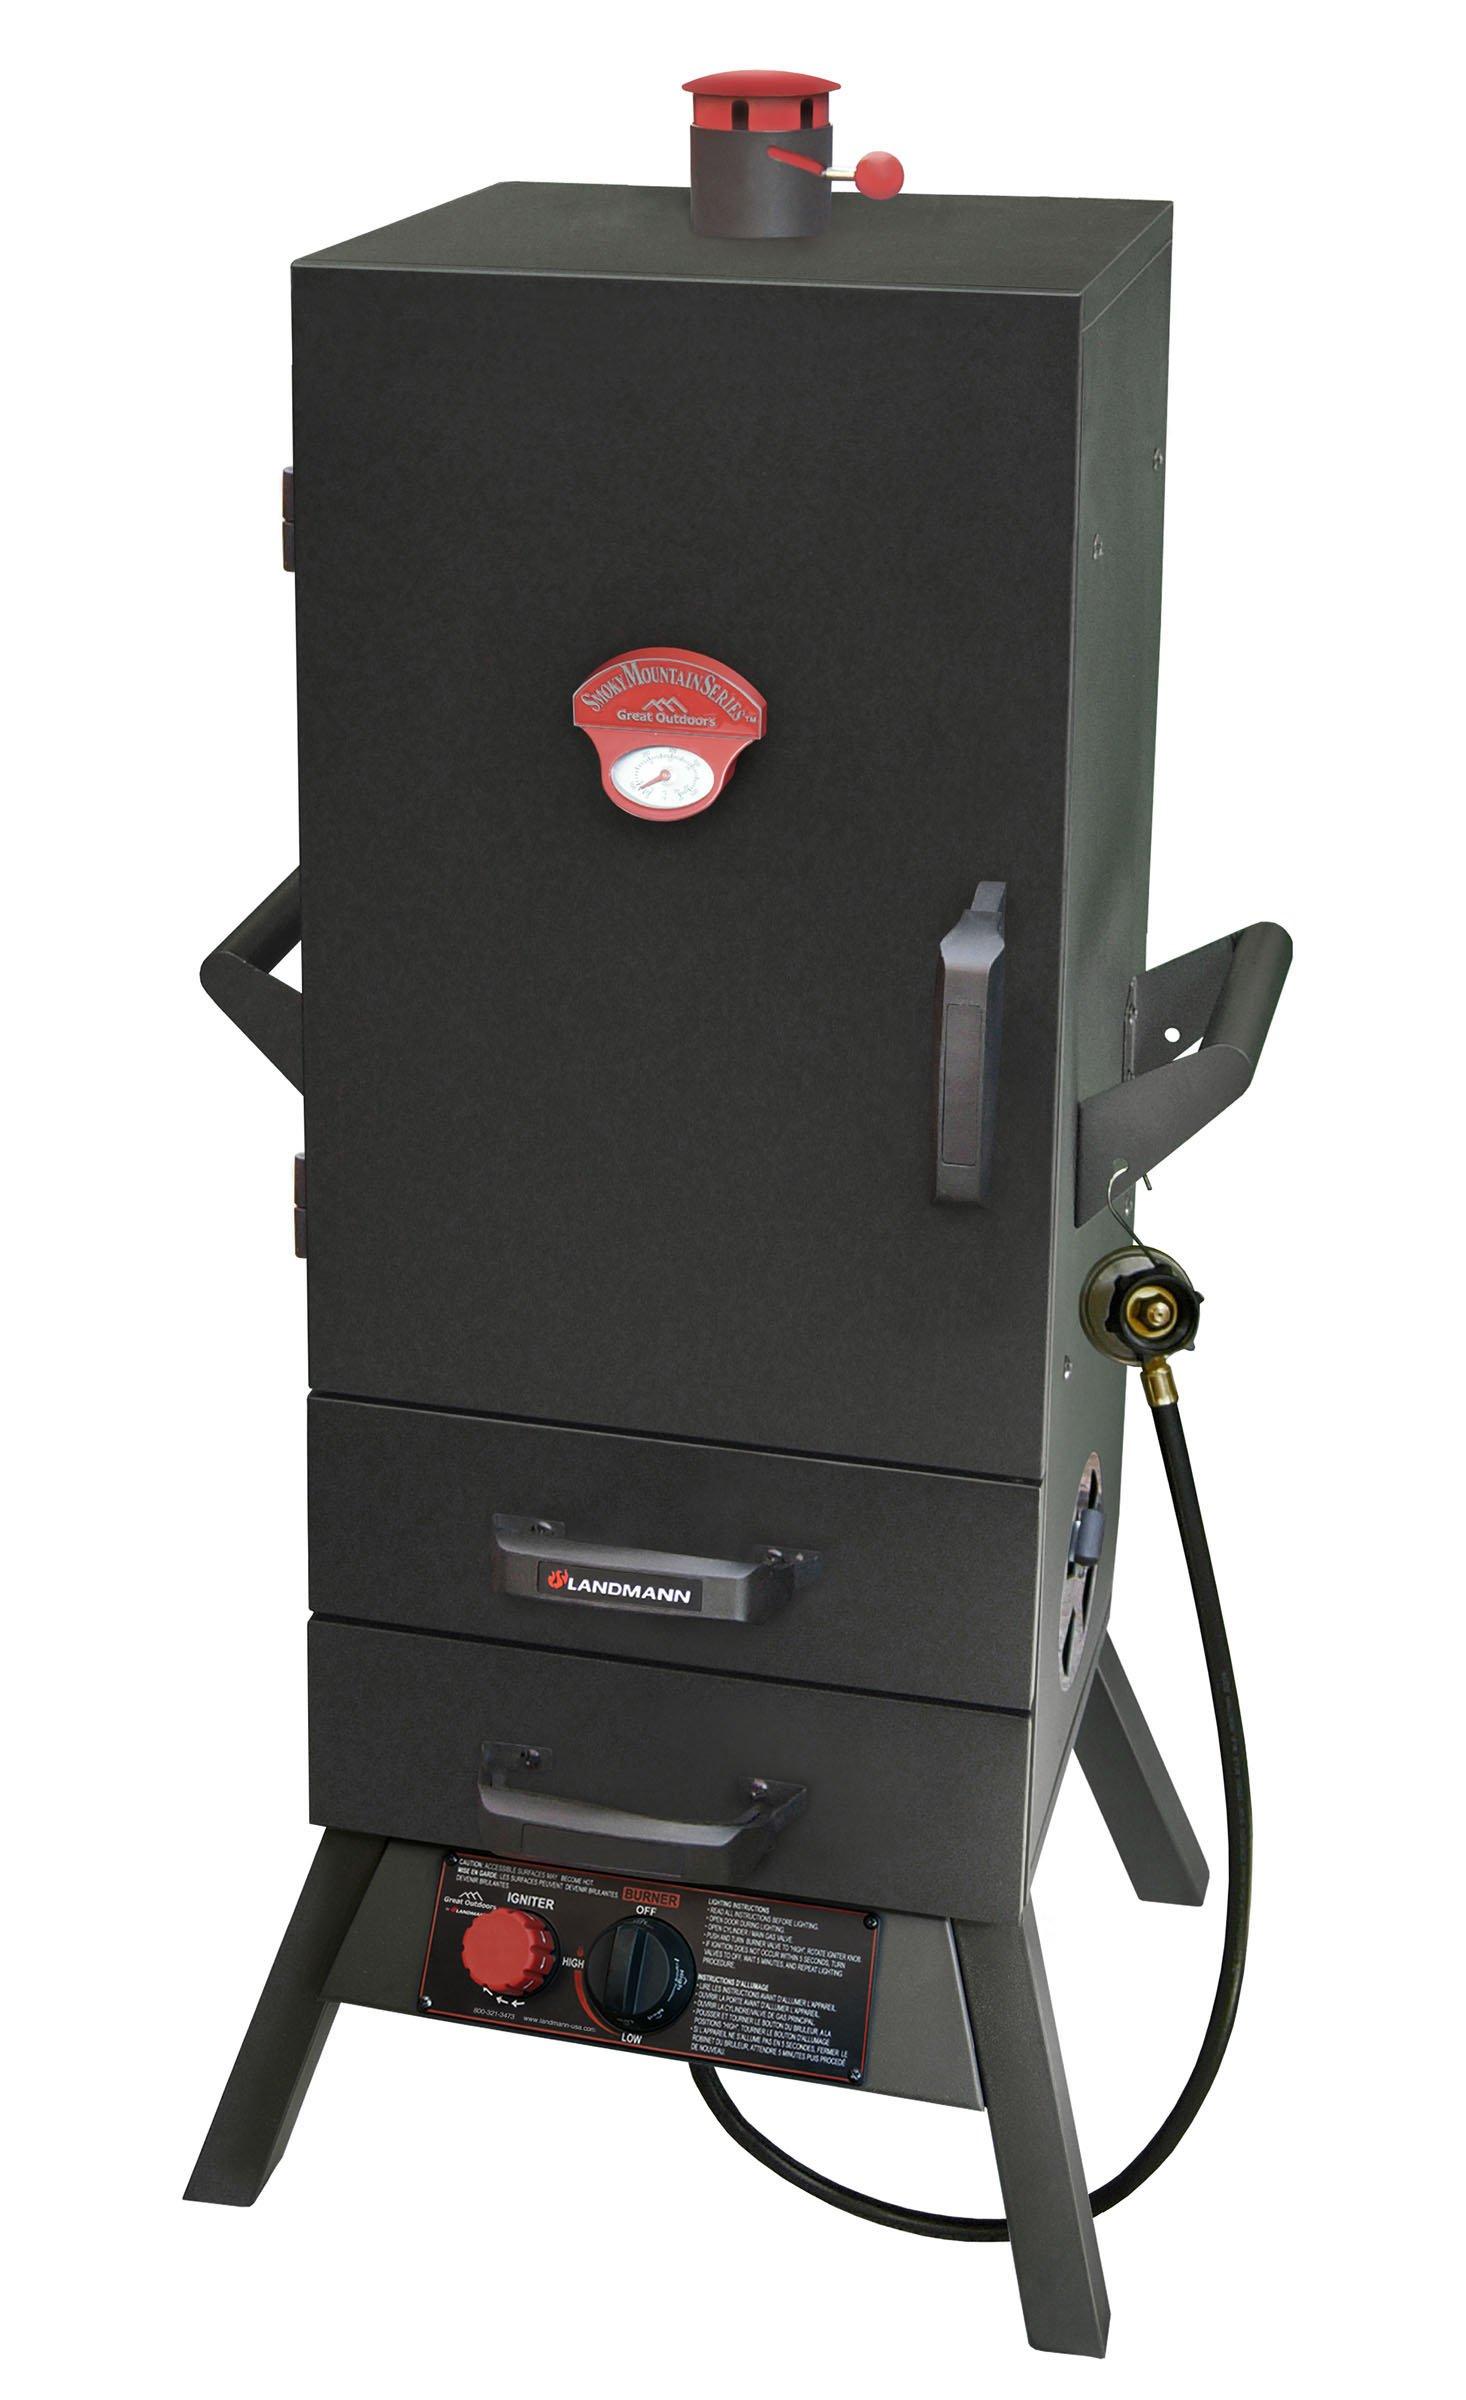 Landmann USA 3495GLA Smoky Mountain Vertical Gas Smoker, 34-in